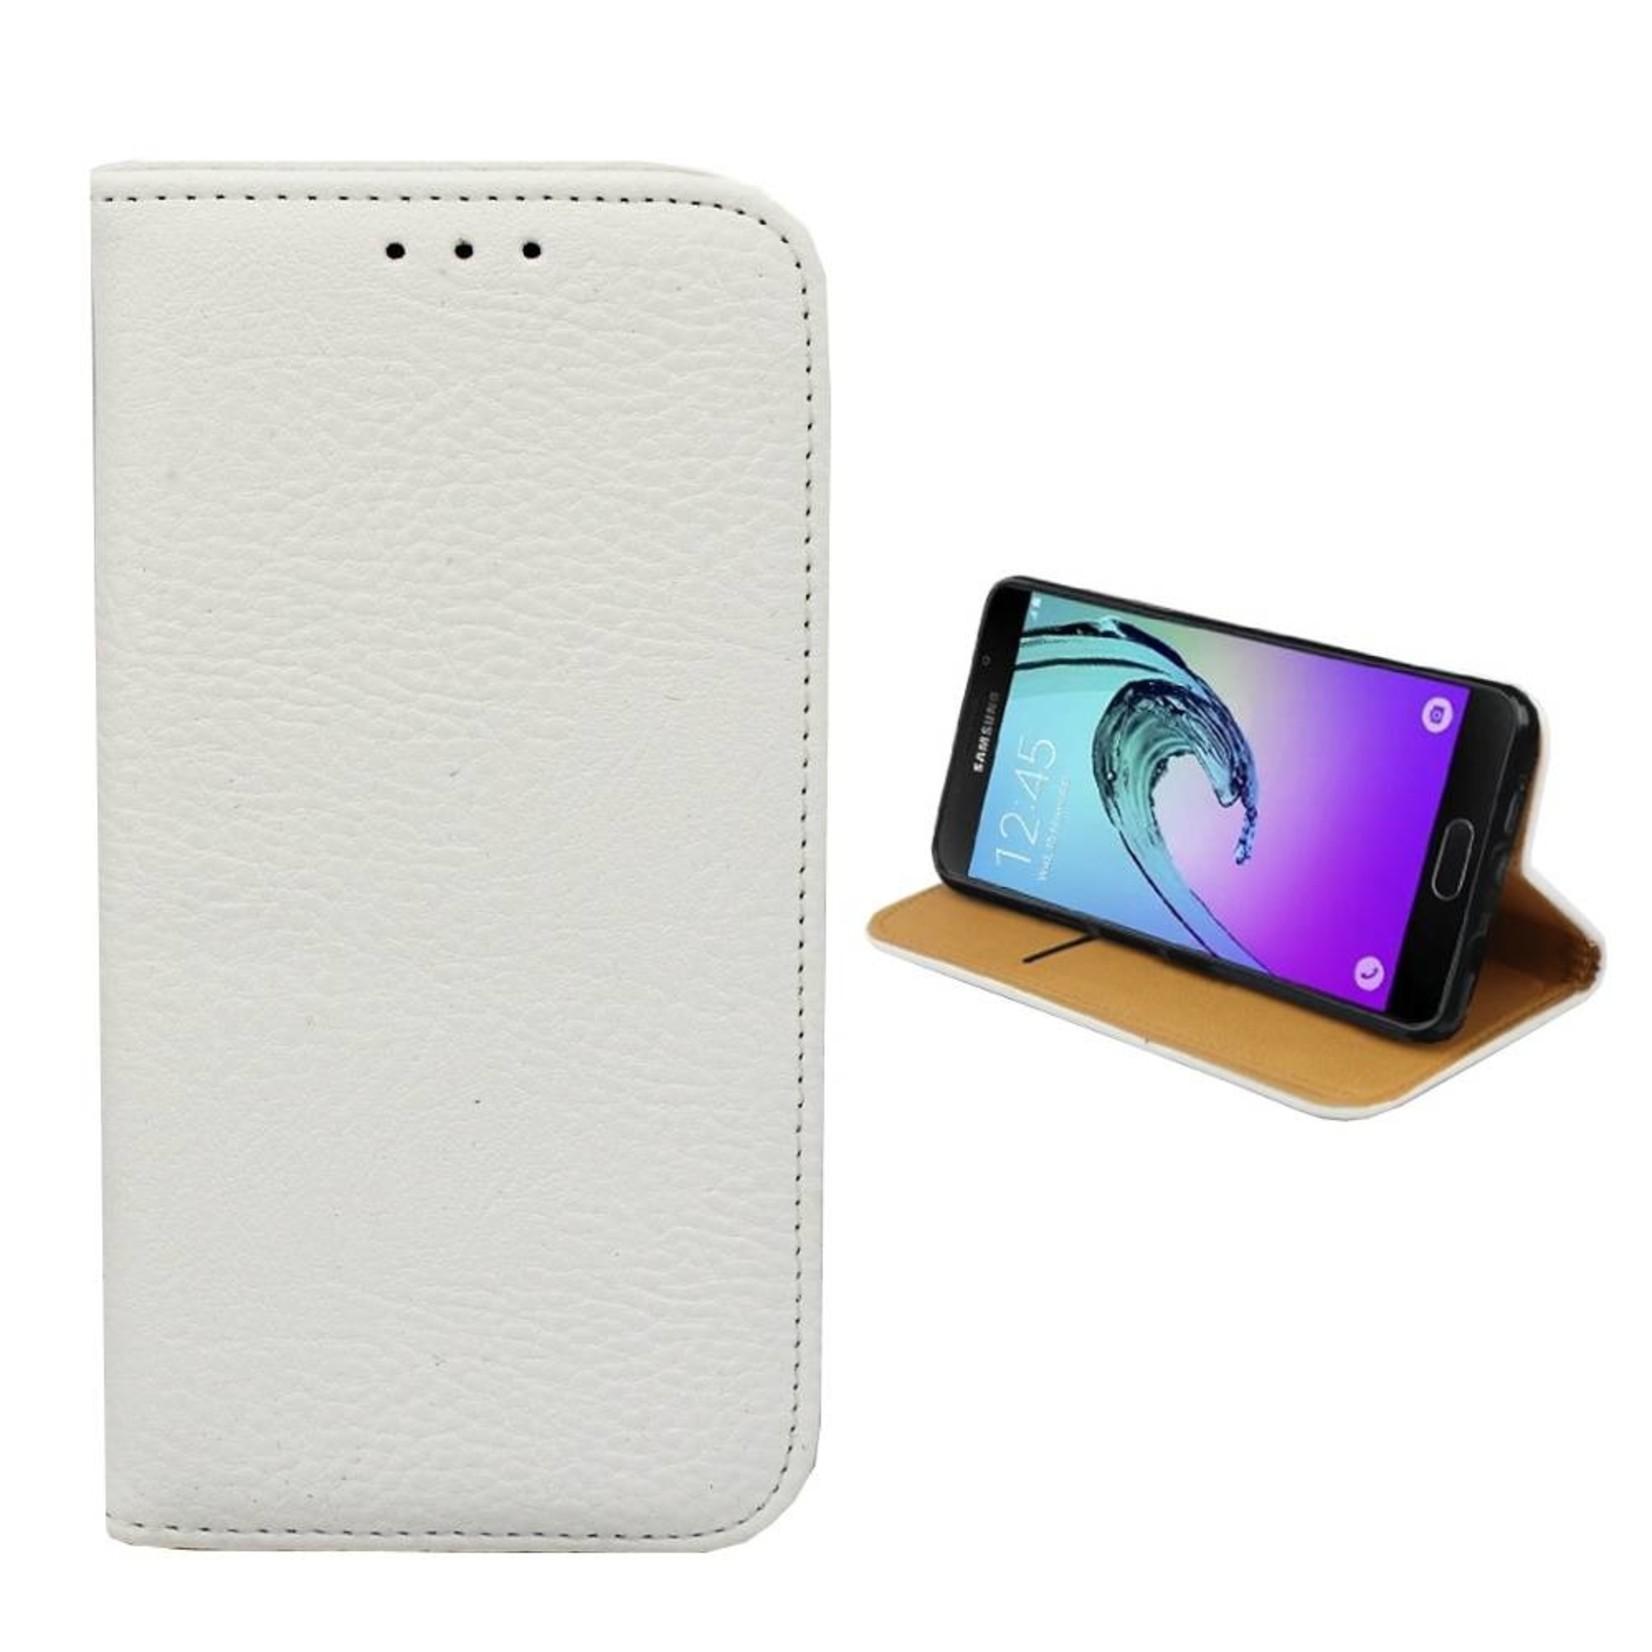 Colorfone Hoesje Book voor Samsung A9 2016 Wit